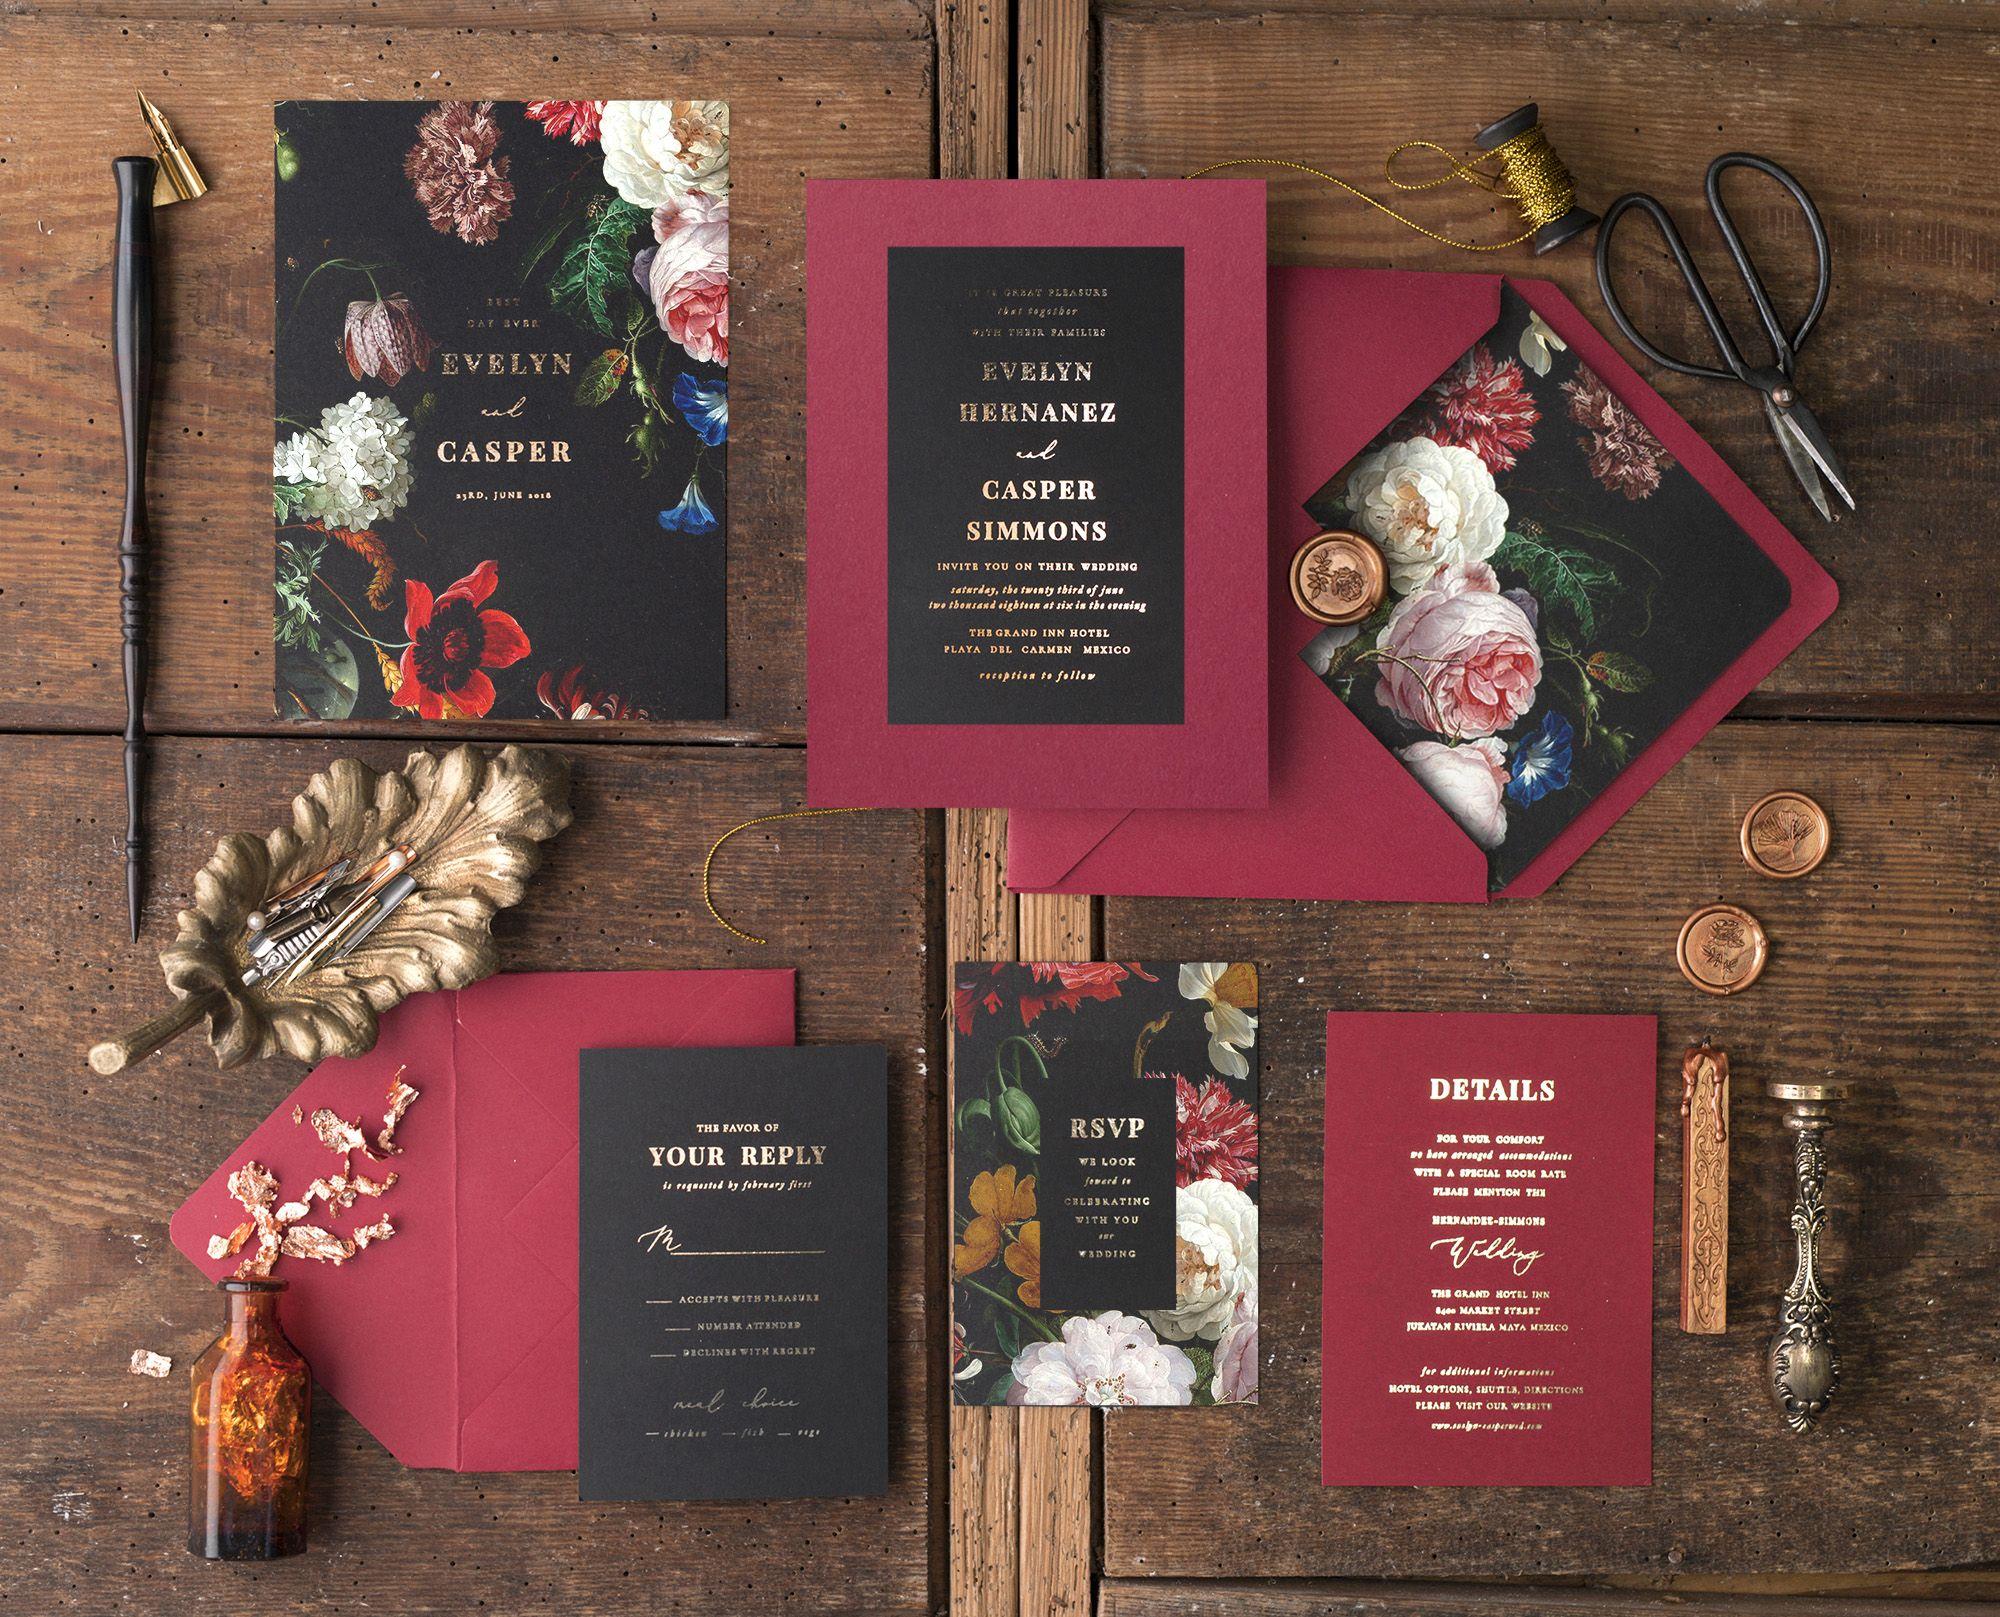 WEDDING INVITATIONS glitter | Invitation paper, Weddings and Wedding